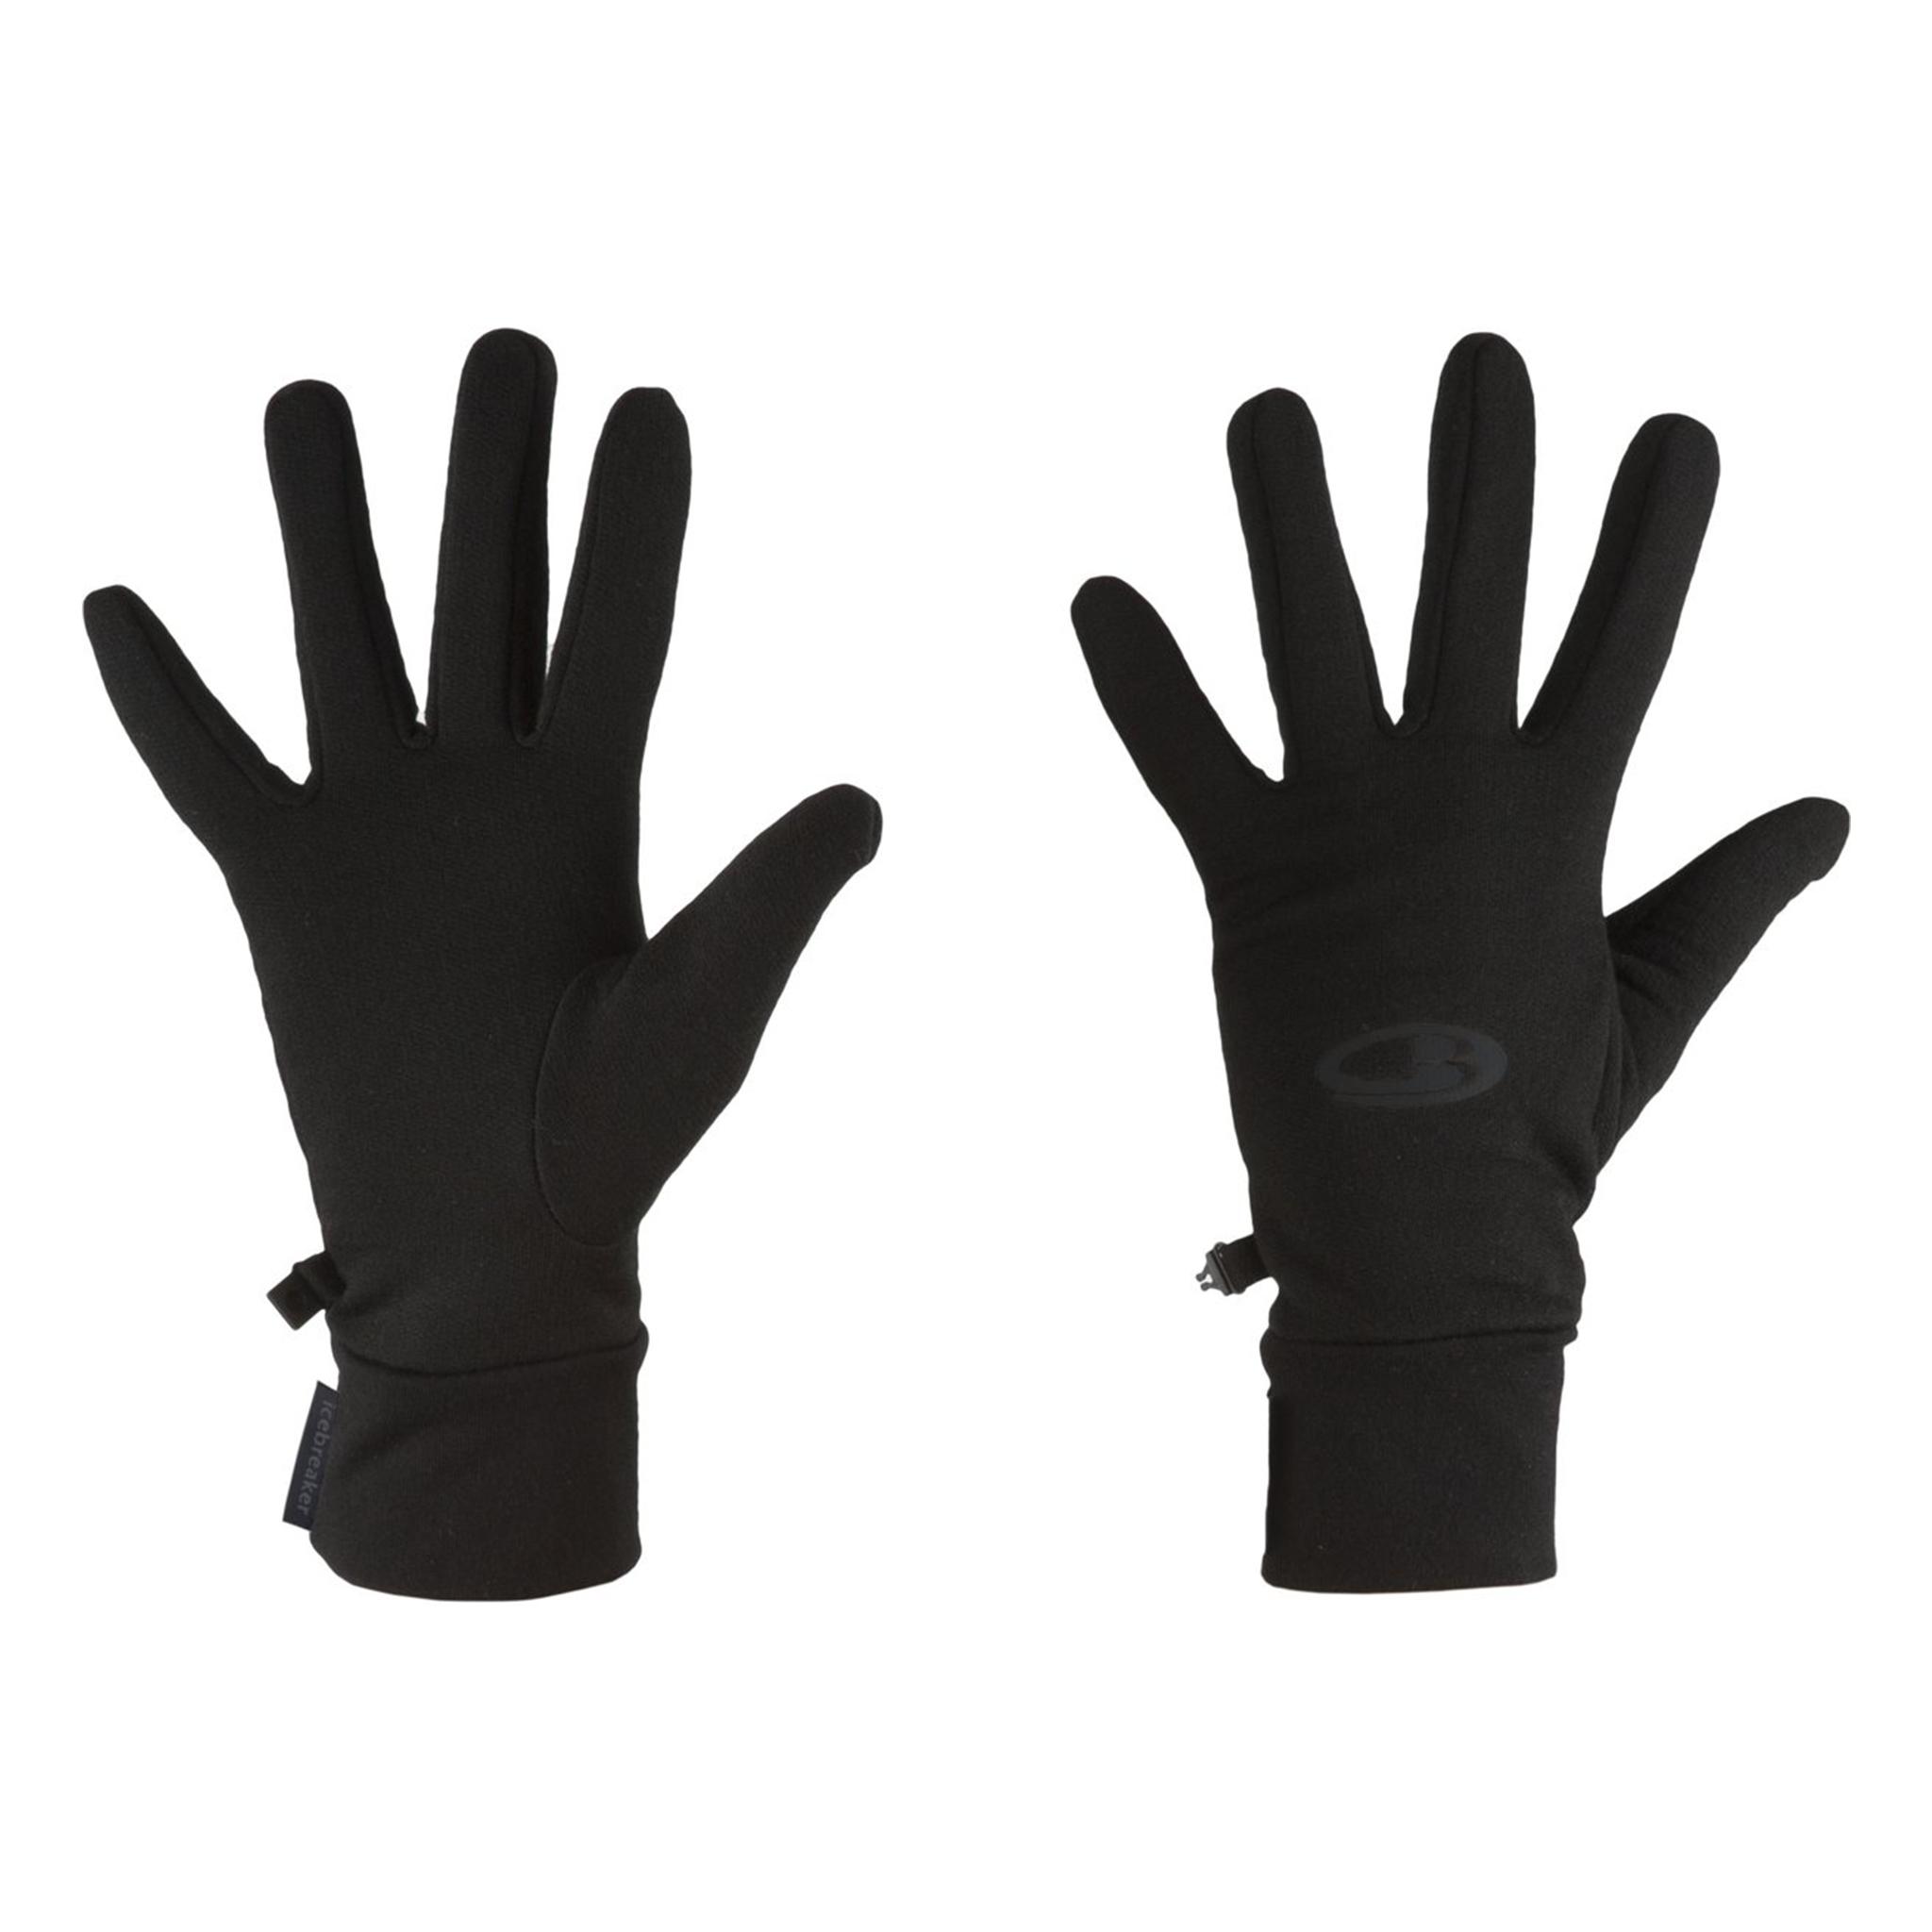 Icebreaker Merino Clothing Inc Icebreaker Sierra Mittens Black Size XS